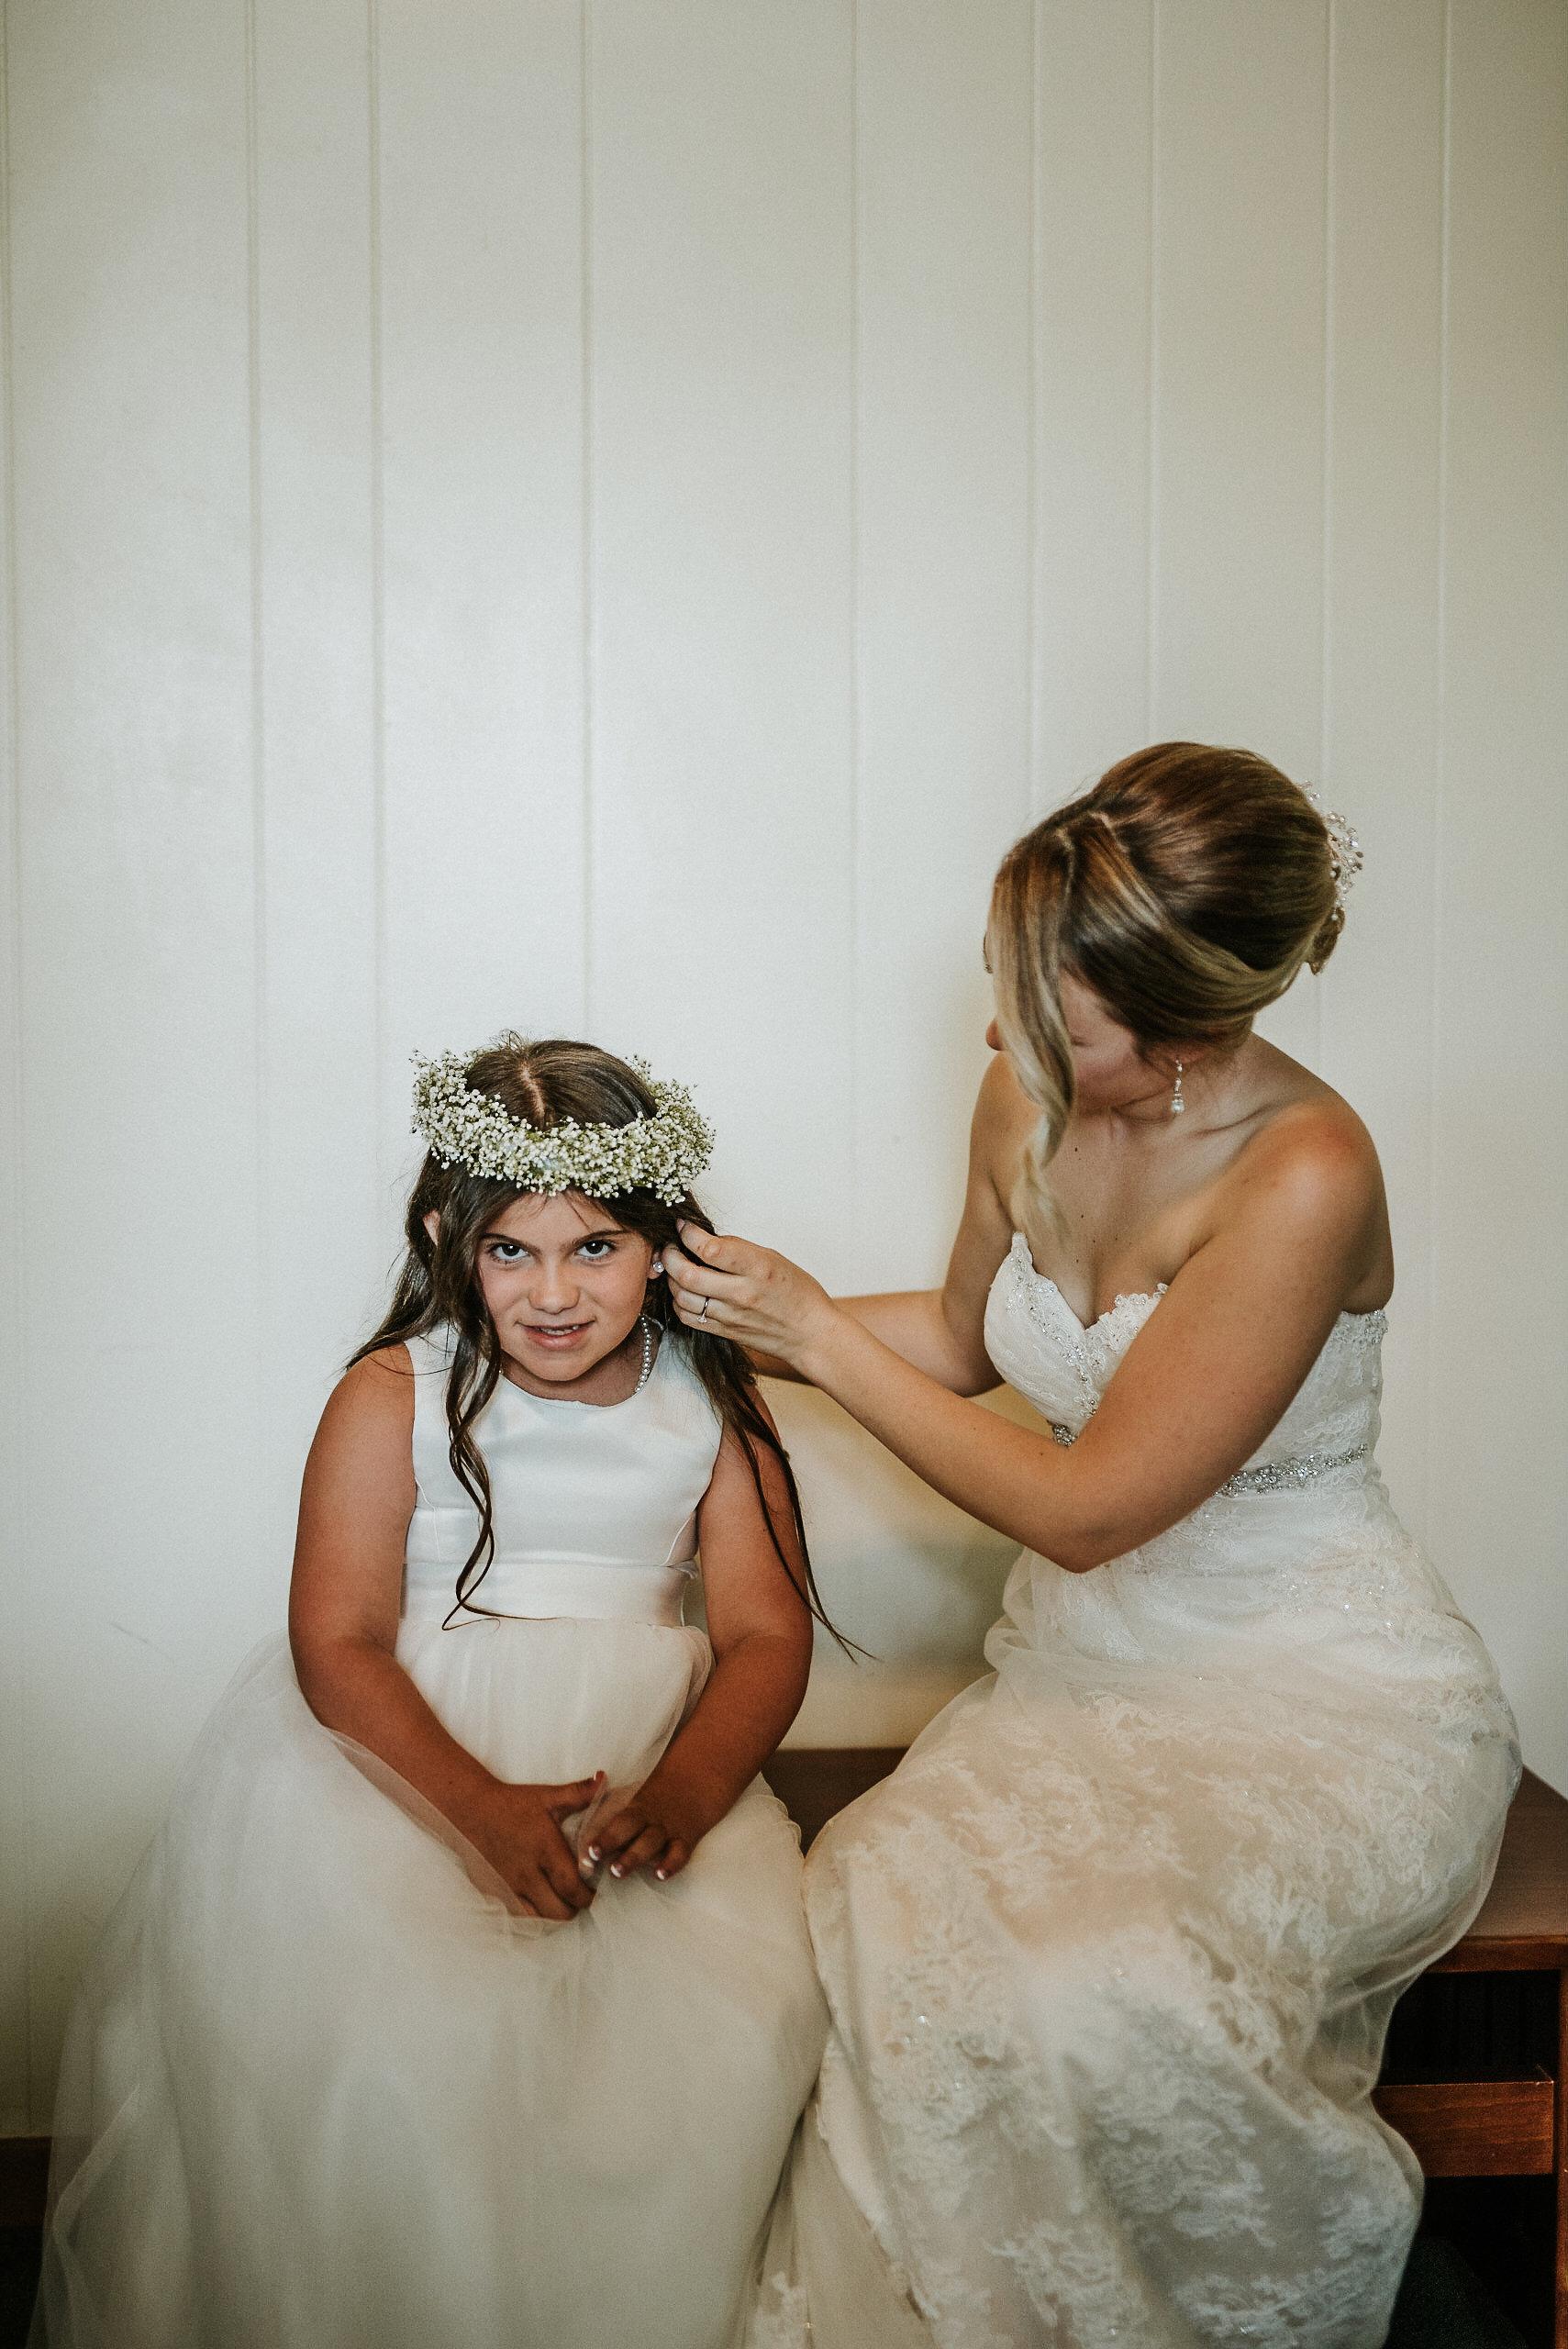 Bride helping flower girl